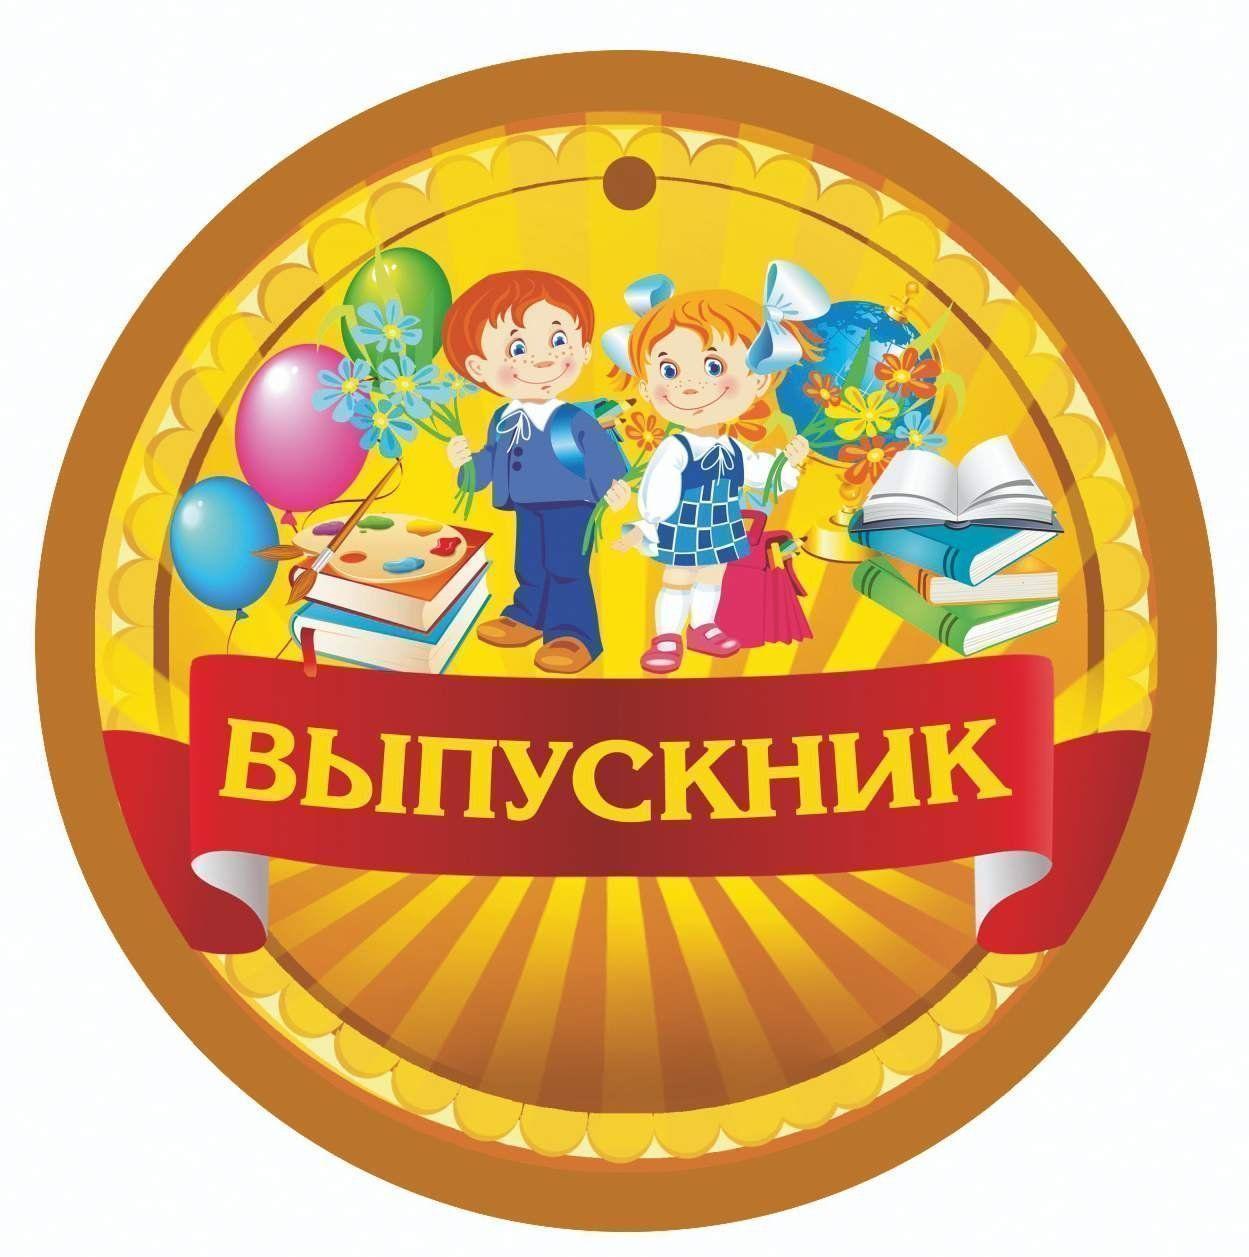 Медаль Выпускник (начальная школа, детский сад): 90х90Медали<br>.<br><br>Год: 2017<br>Серия: Открытка-медаль<br>Высота: 90<br>Ширина: 90<br>Переплёт: набор